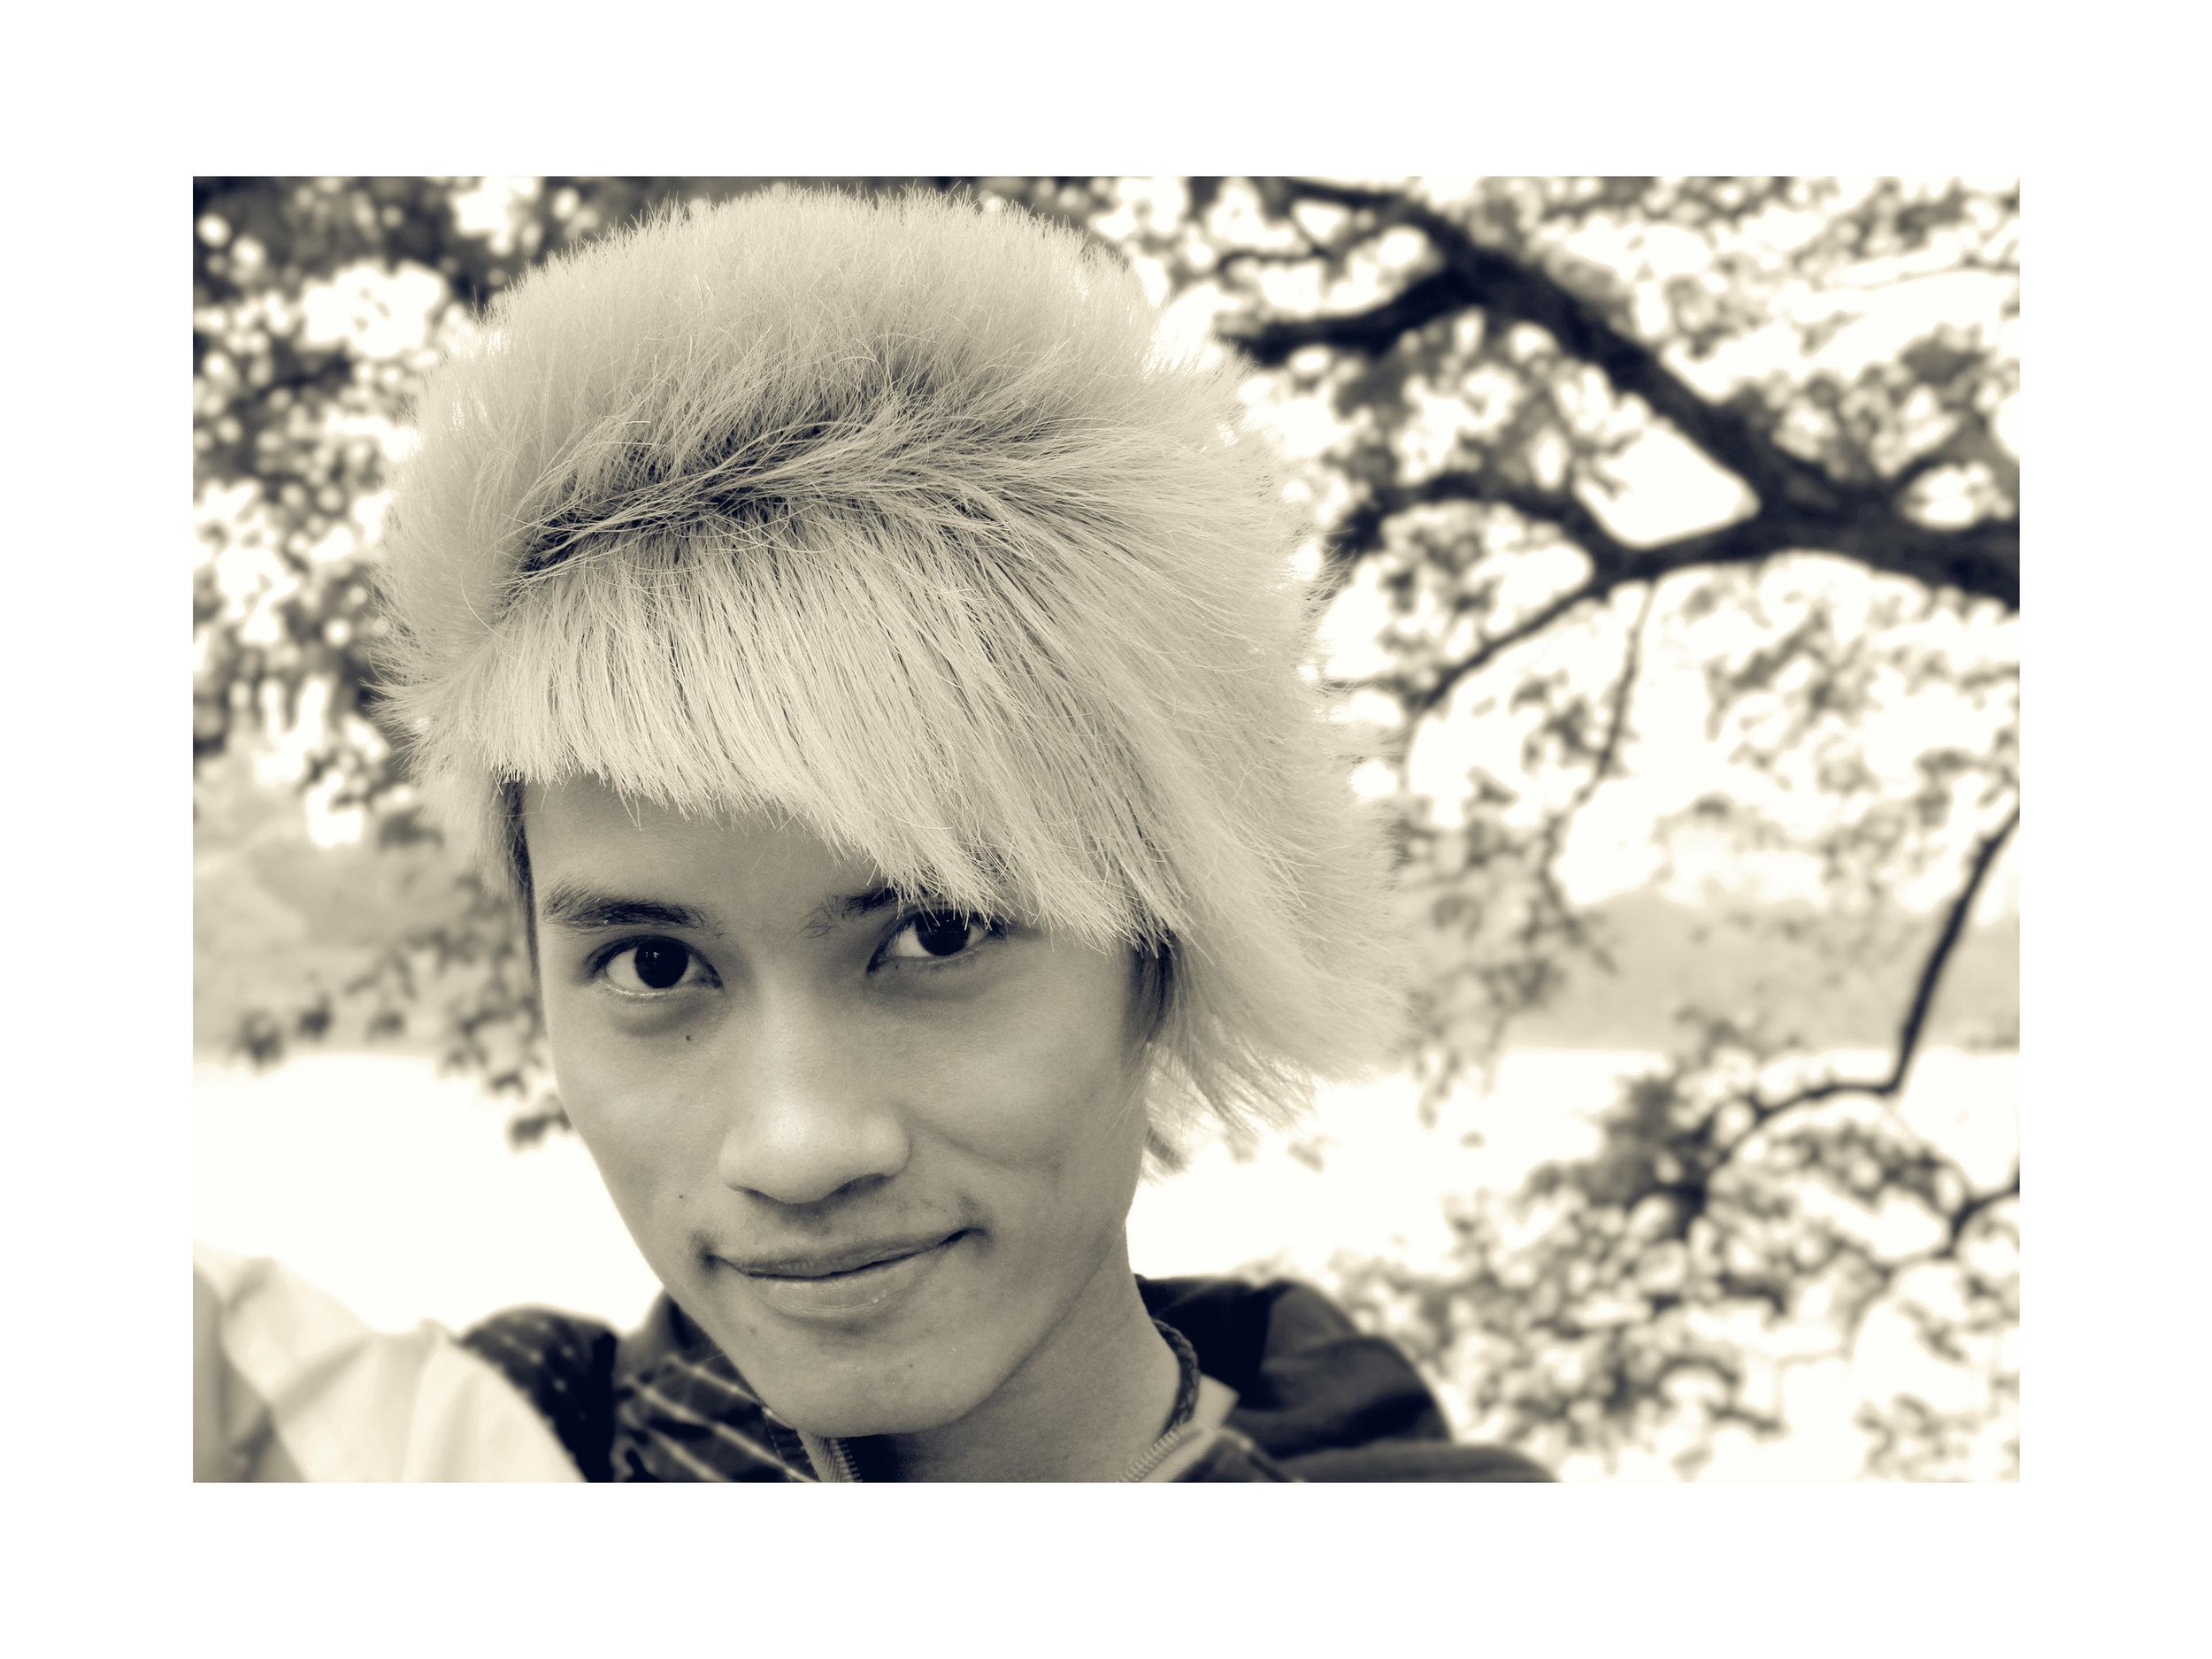 JW_face VI_015.jpg